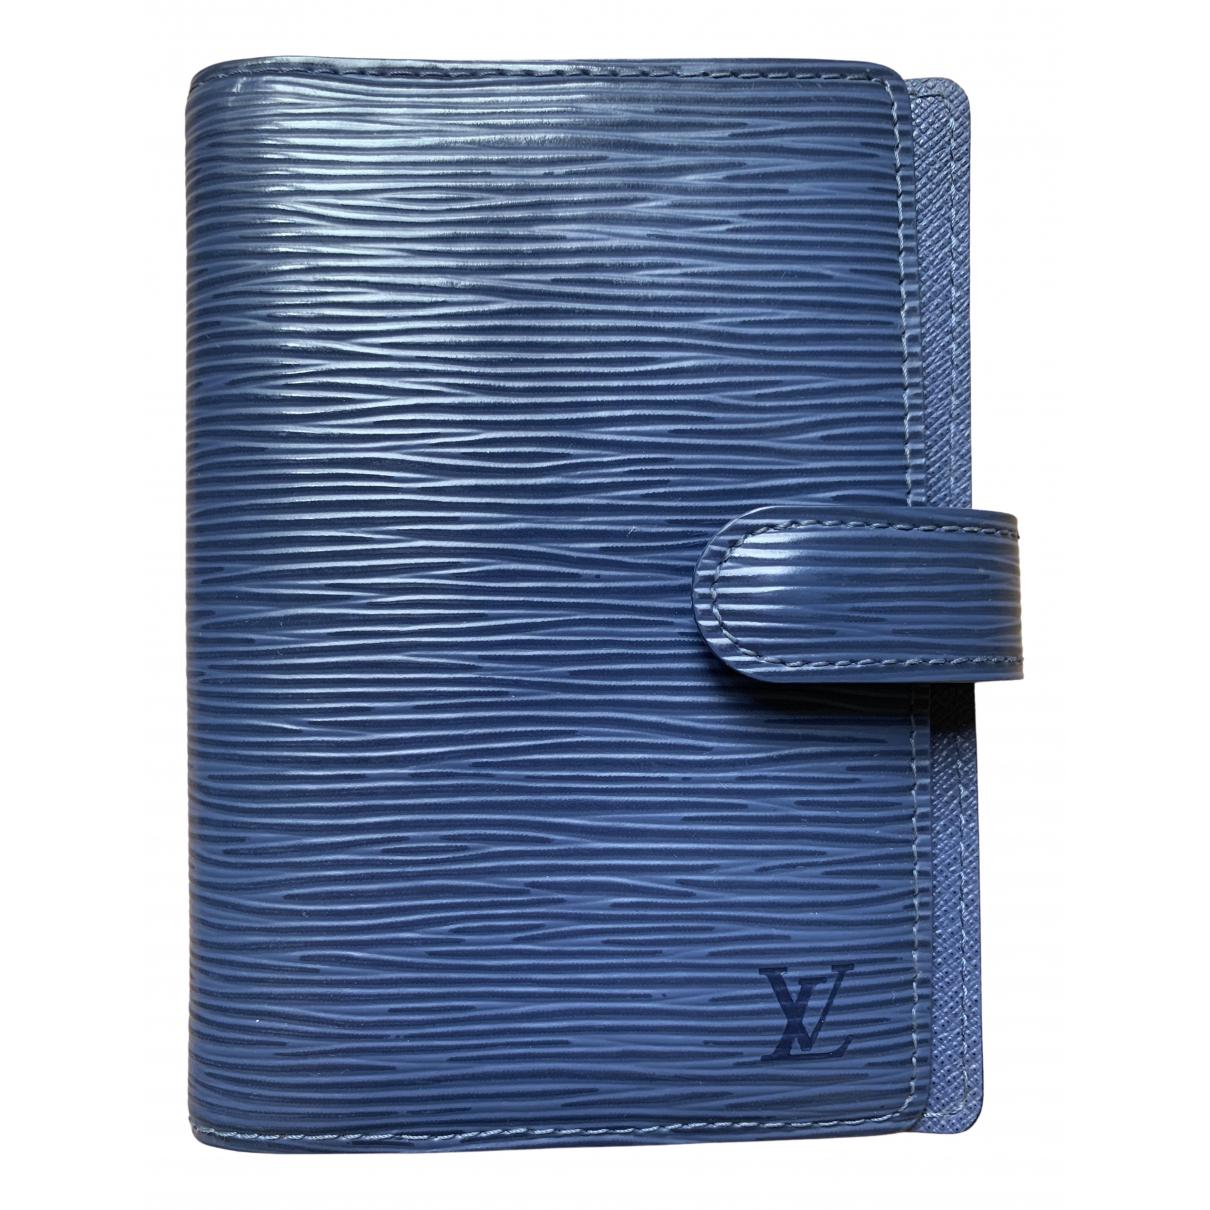 Louis Vuitton Couverture d'agenda PM Blue Leather Home decor for Life & Living \N